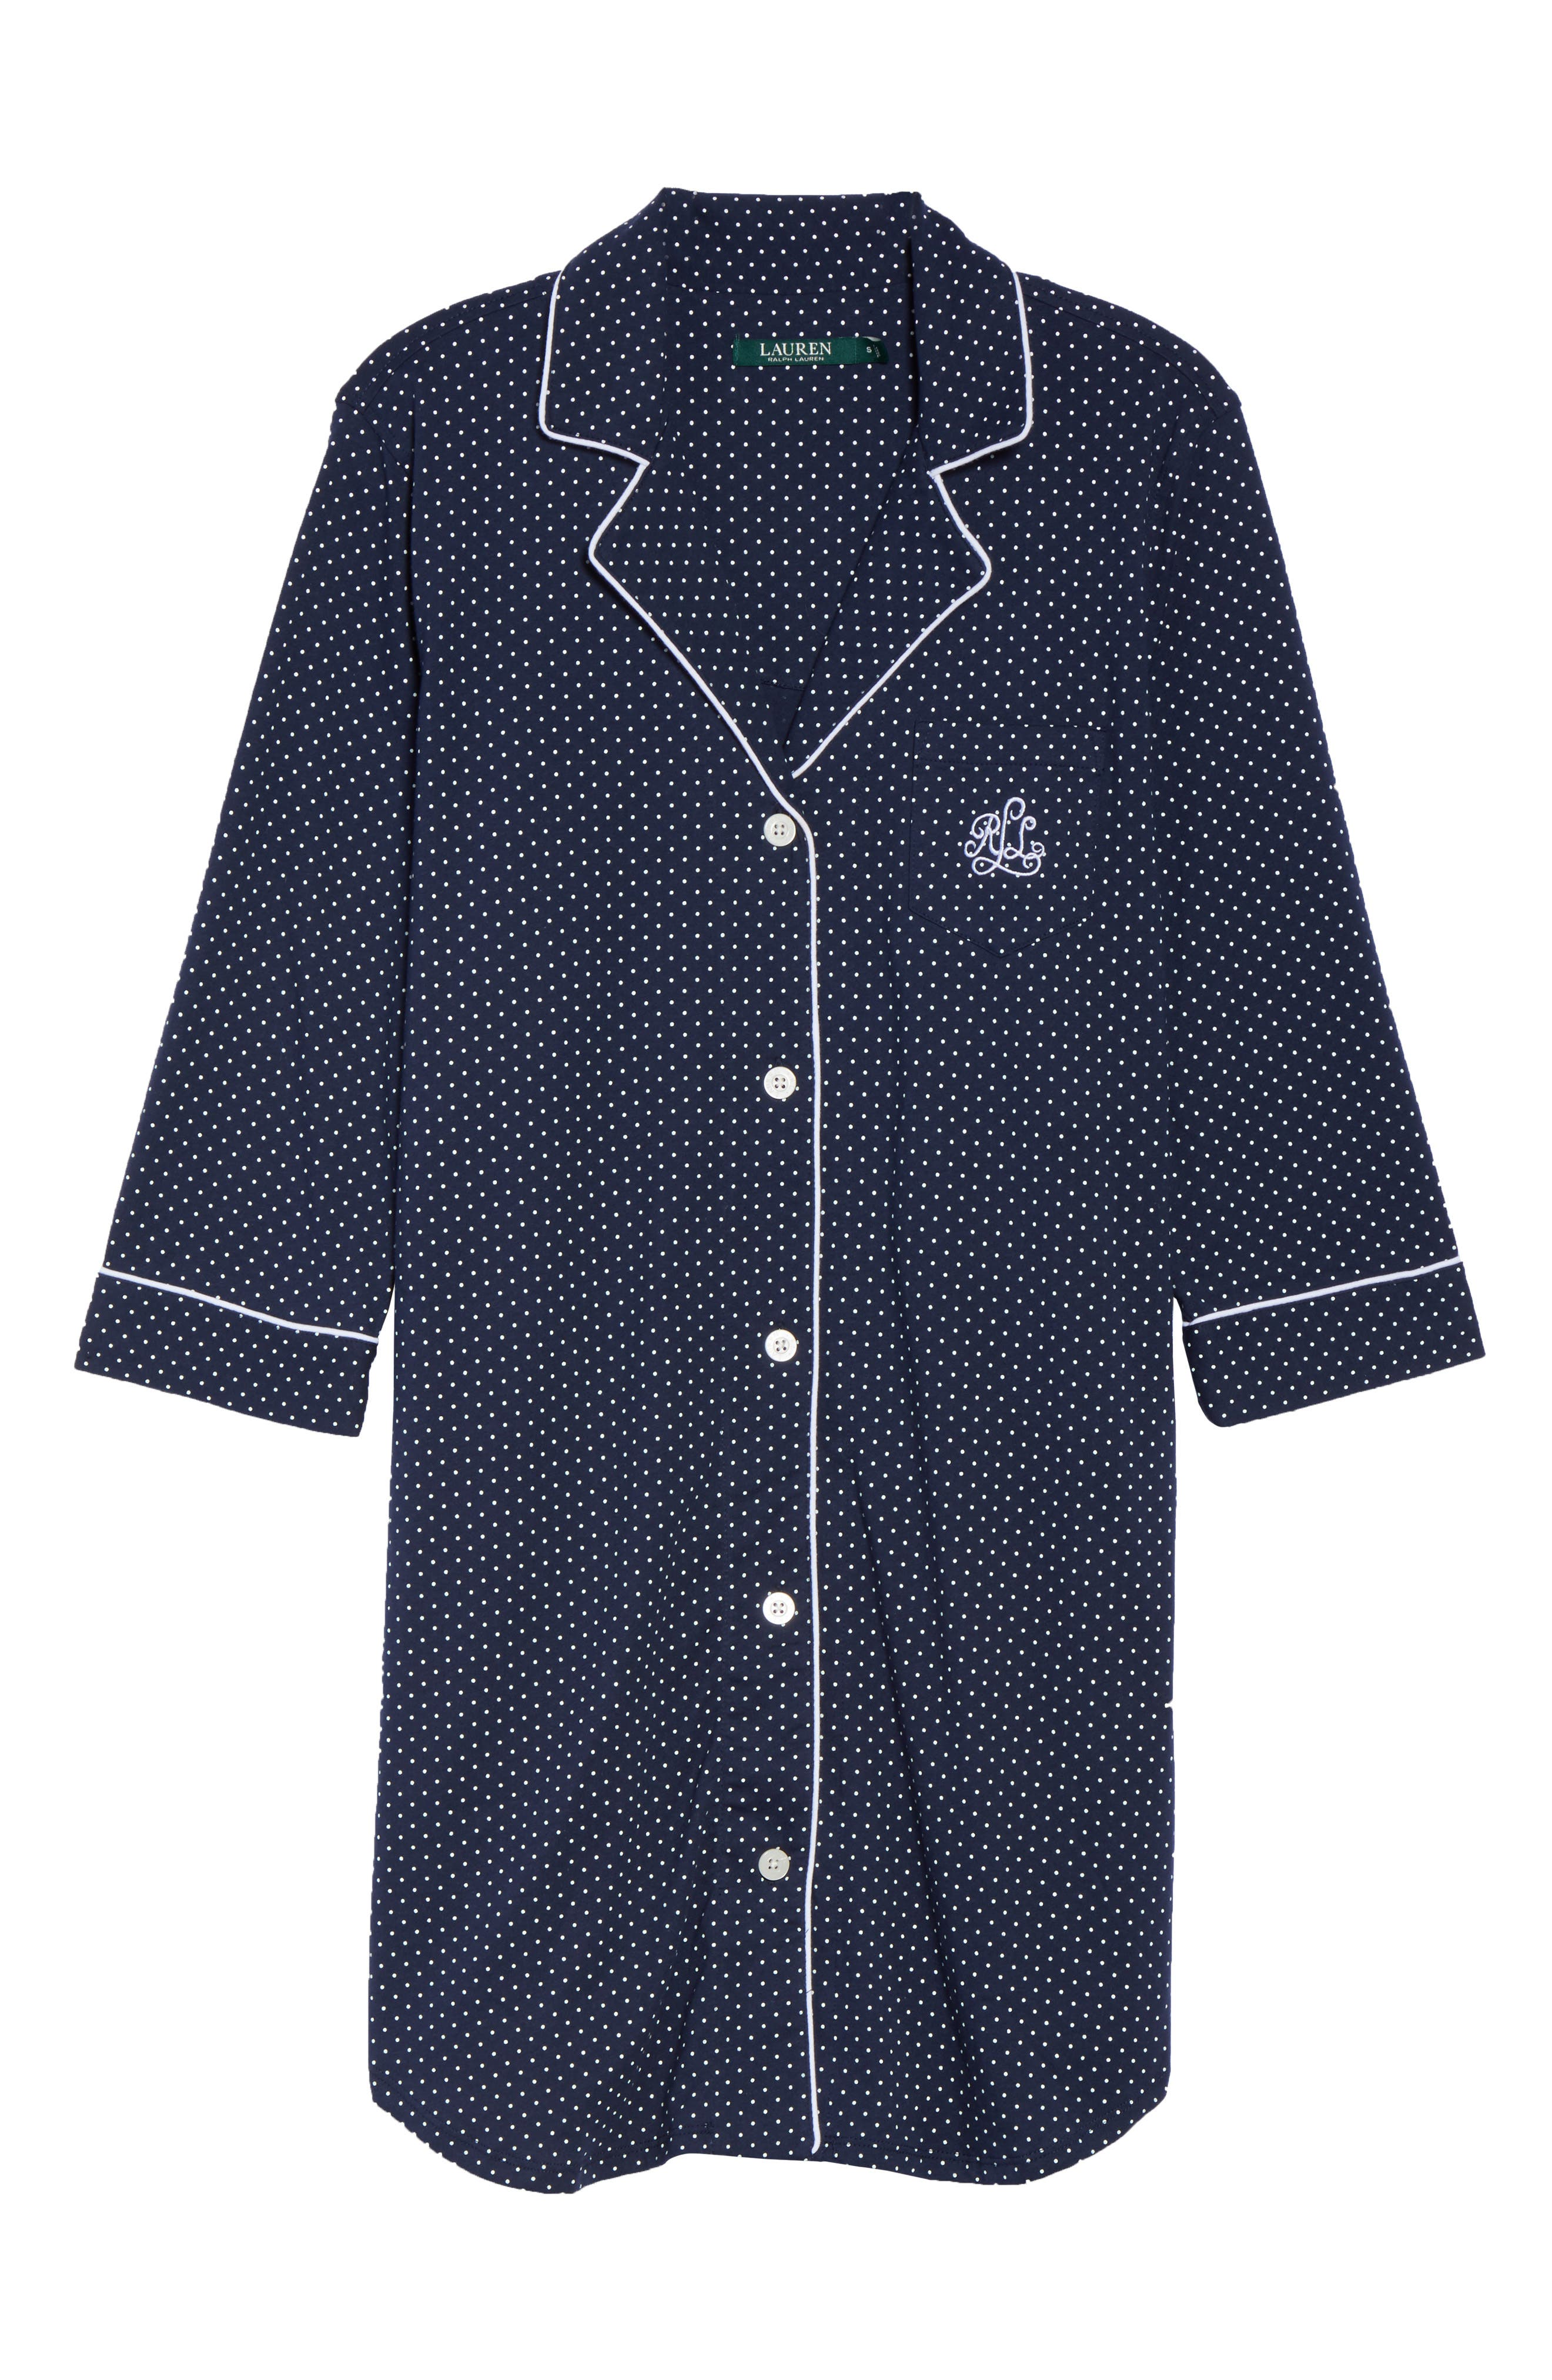 Jersey Sleep Shirt,                             Alternate thumbnail 42, color,